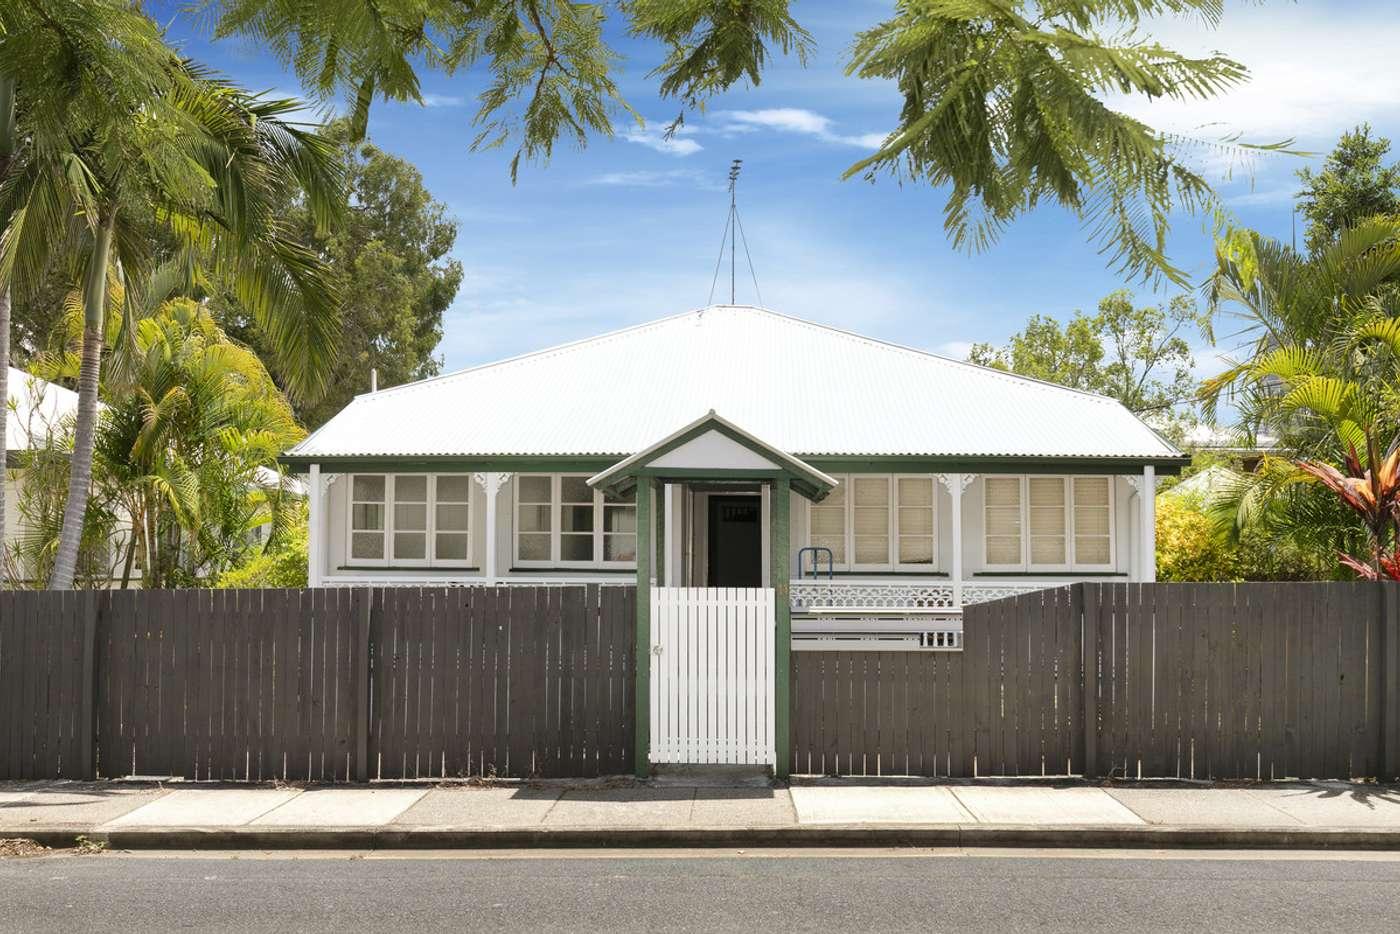 Main view of Homely studio listing, 3/11 Salstone Street, Kangaroo Point QLD 4169